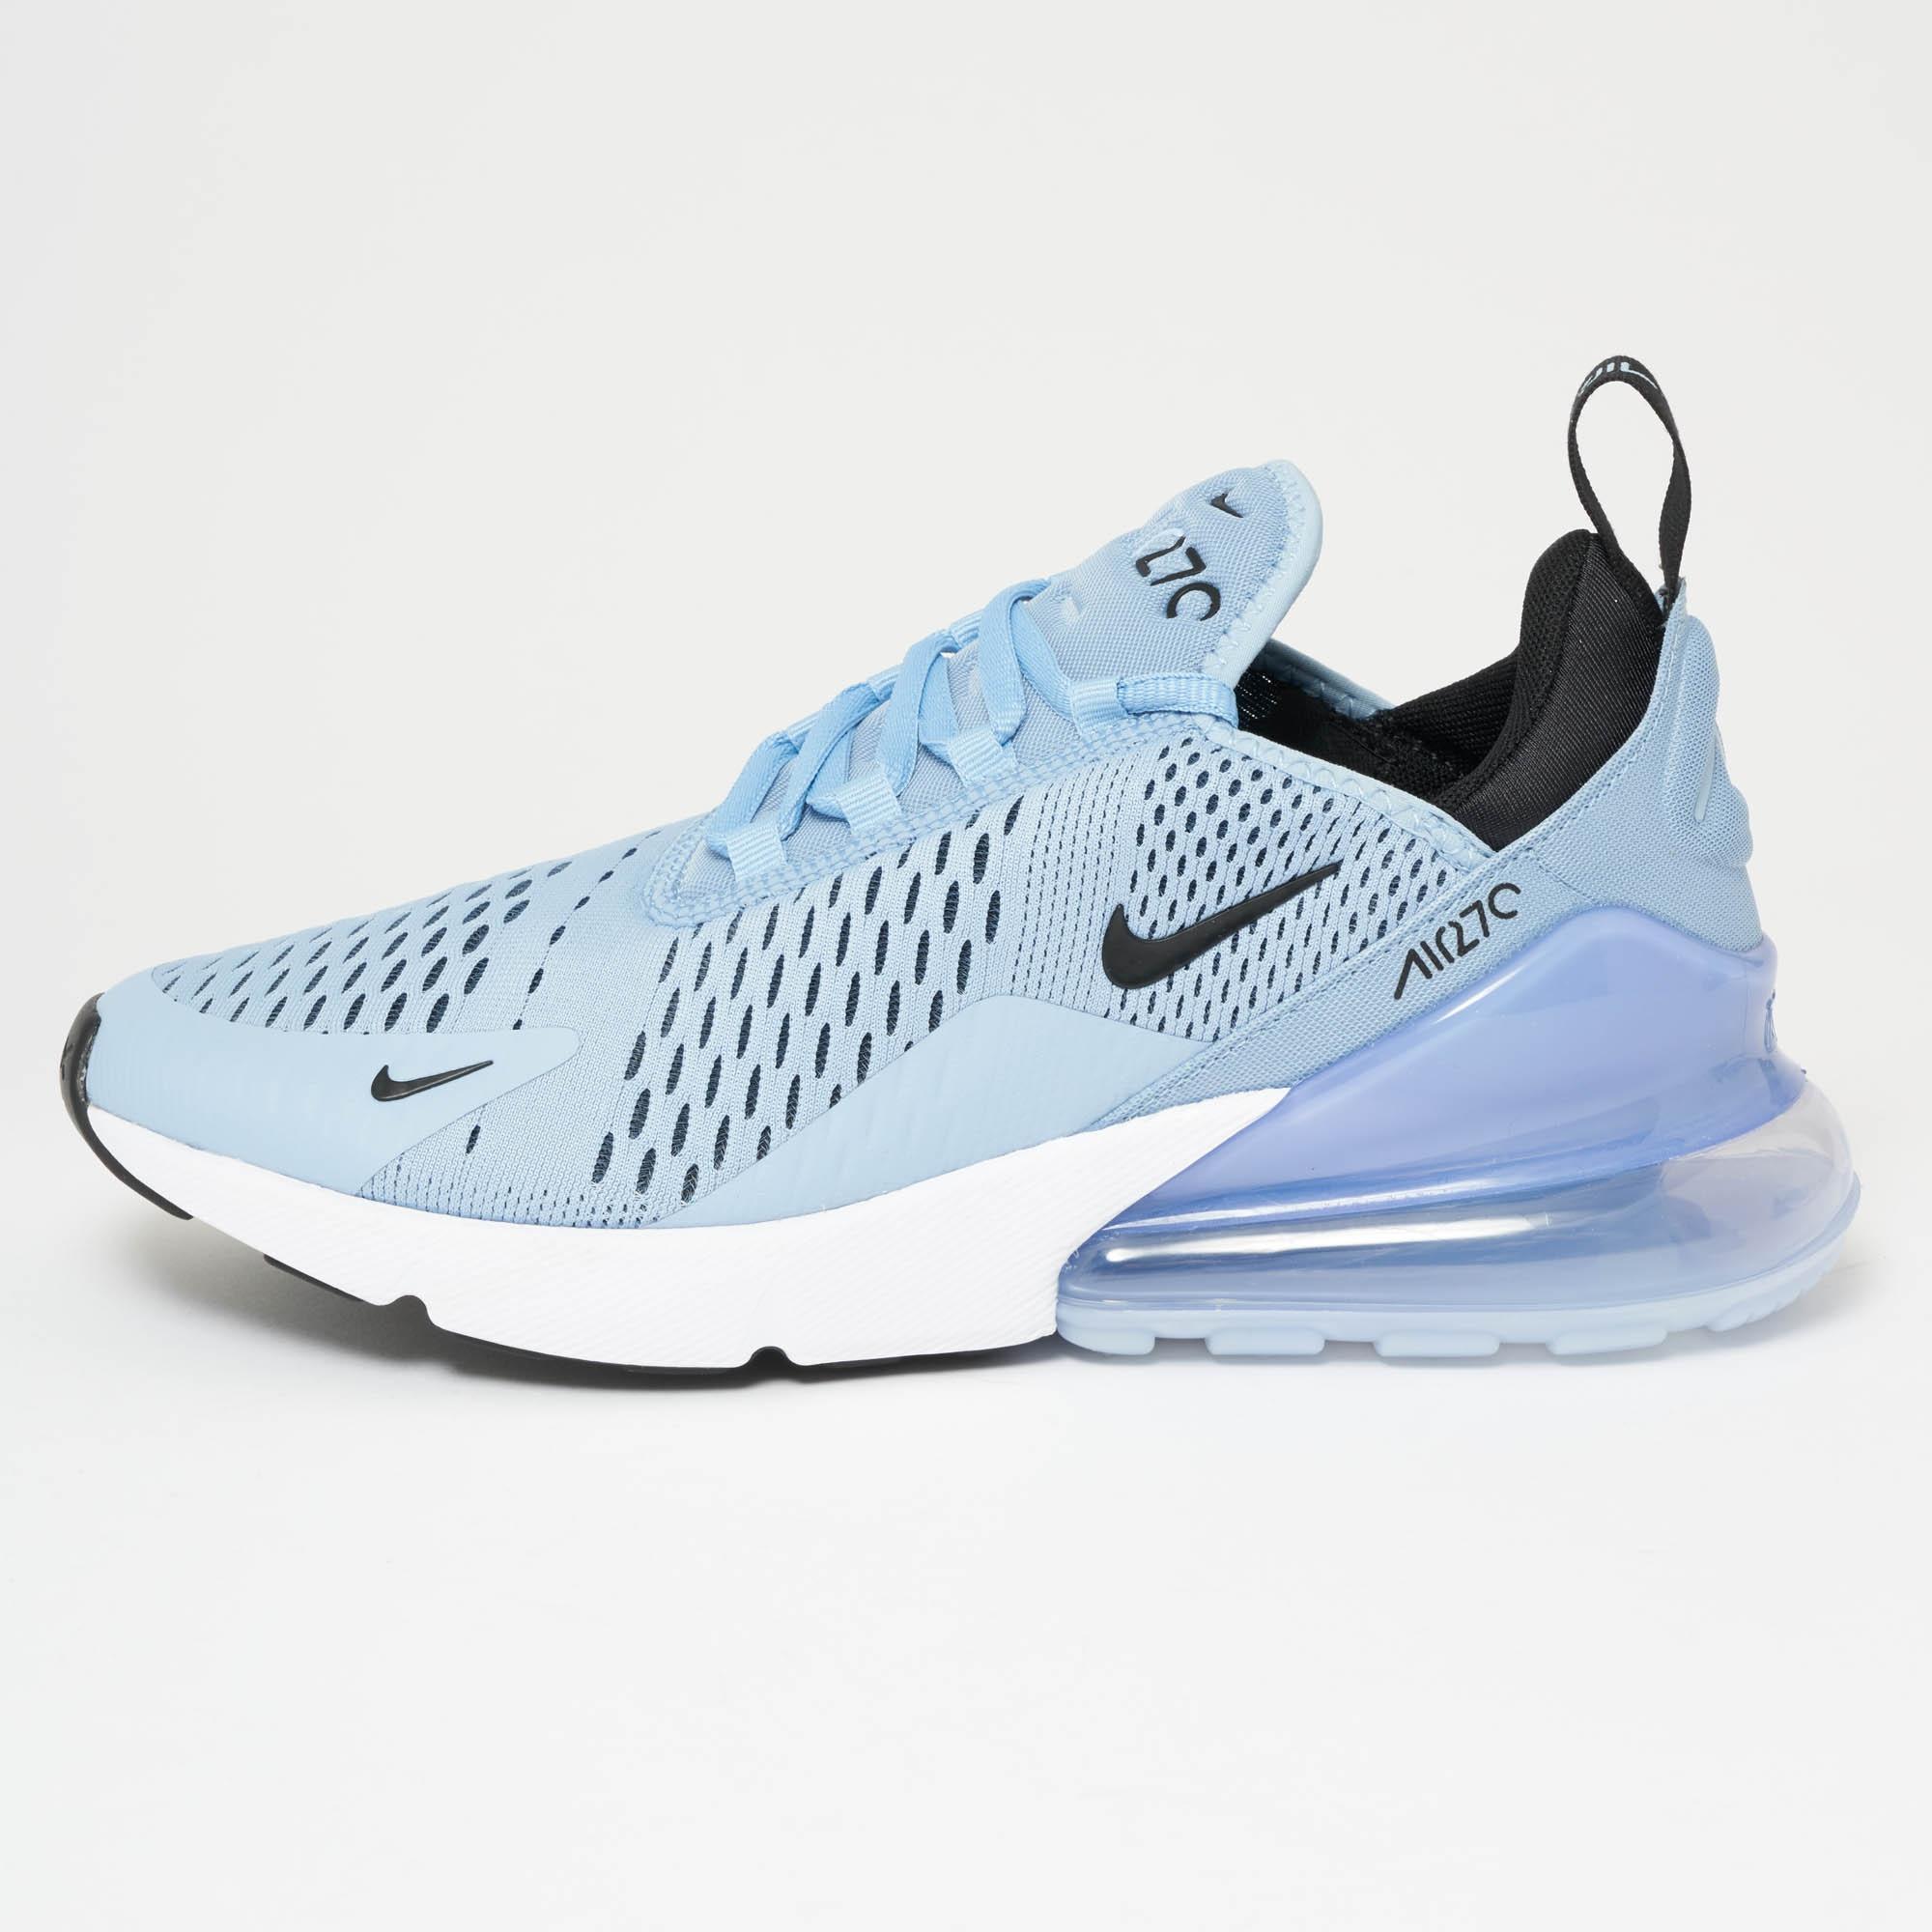 7b381d6ef91 ... cheap lyst nike air max 270 leche blue black white in blue for men  676fa 7bfc1